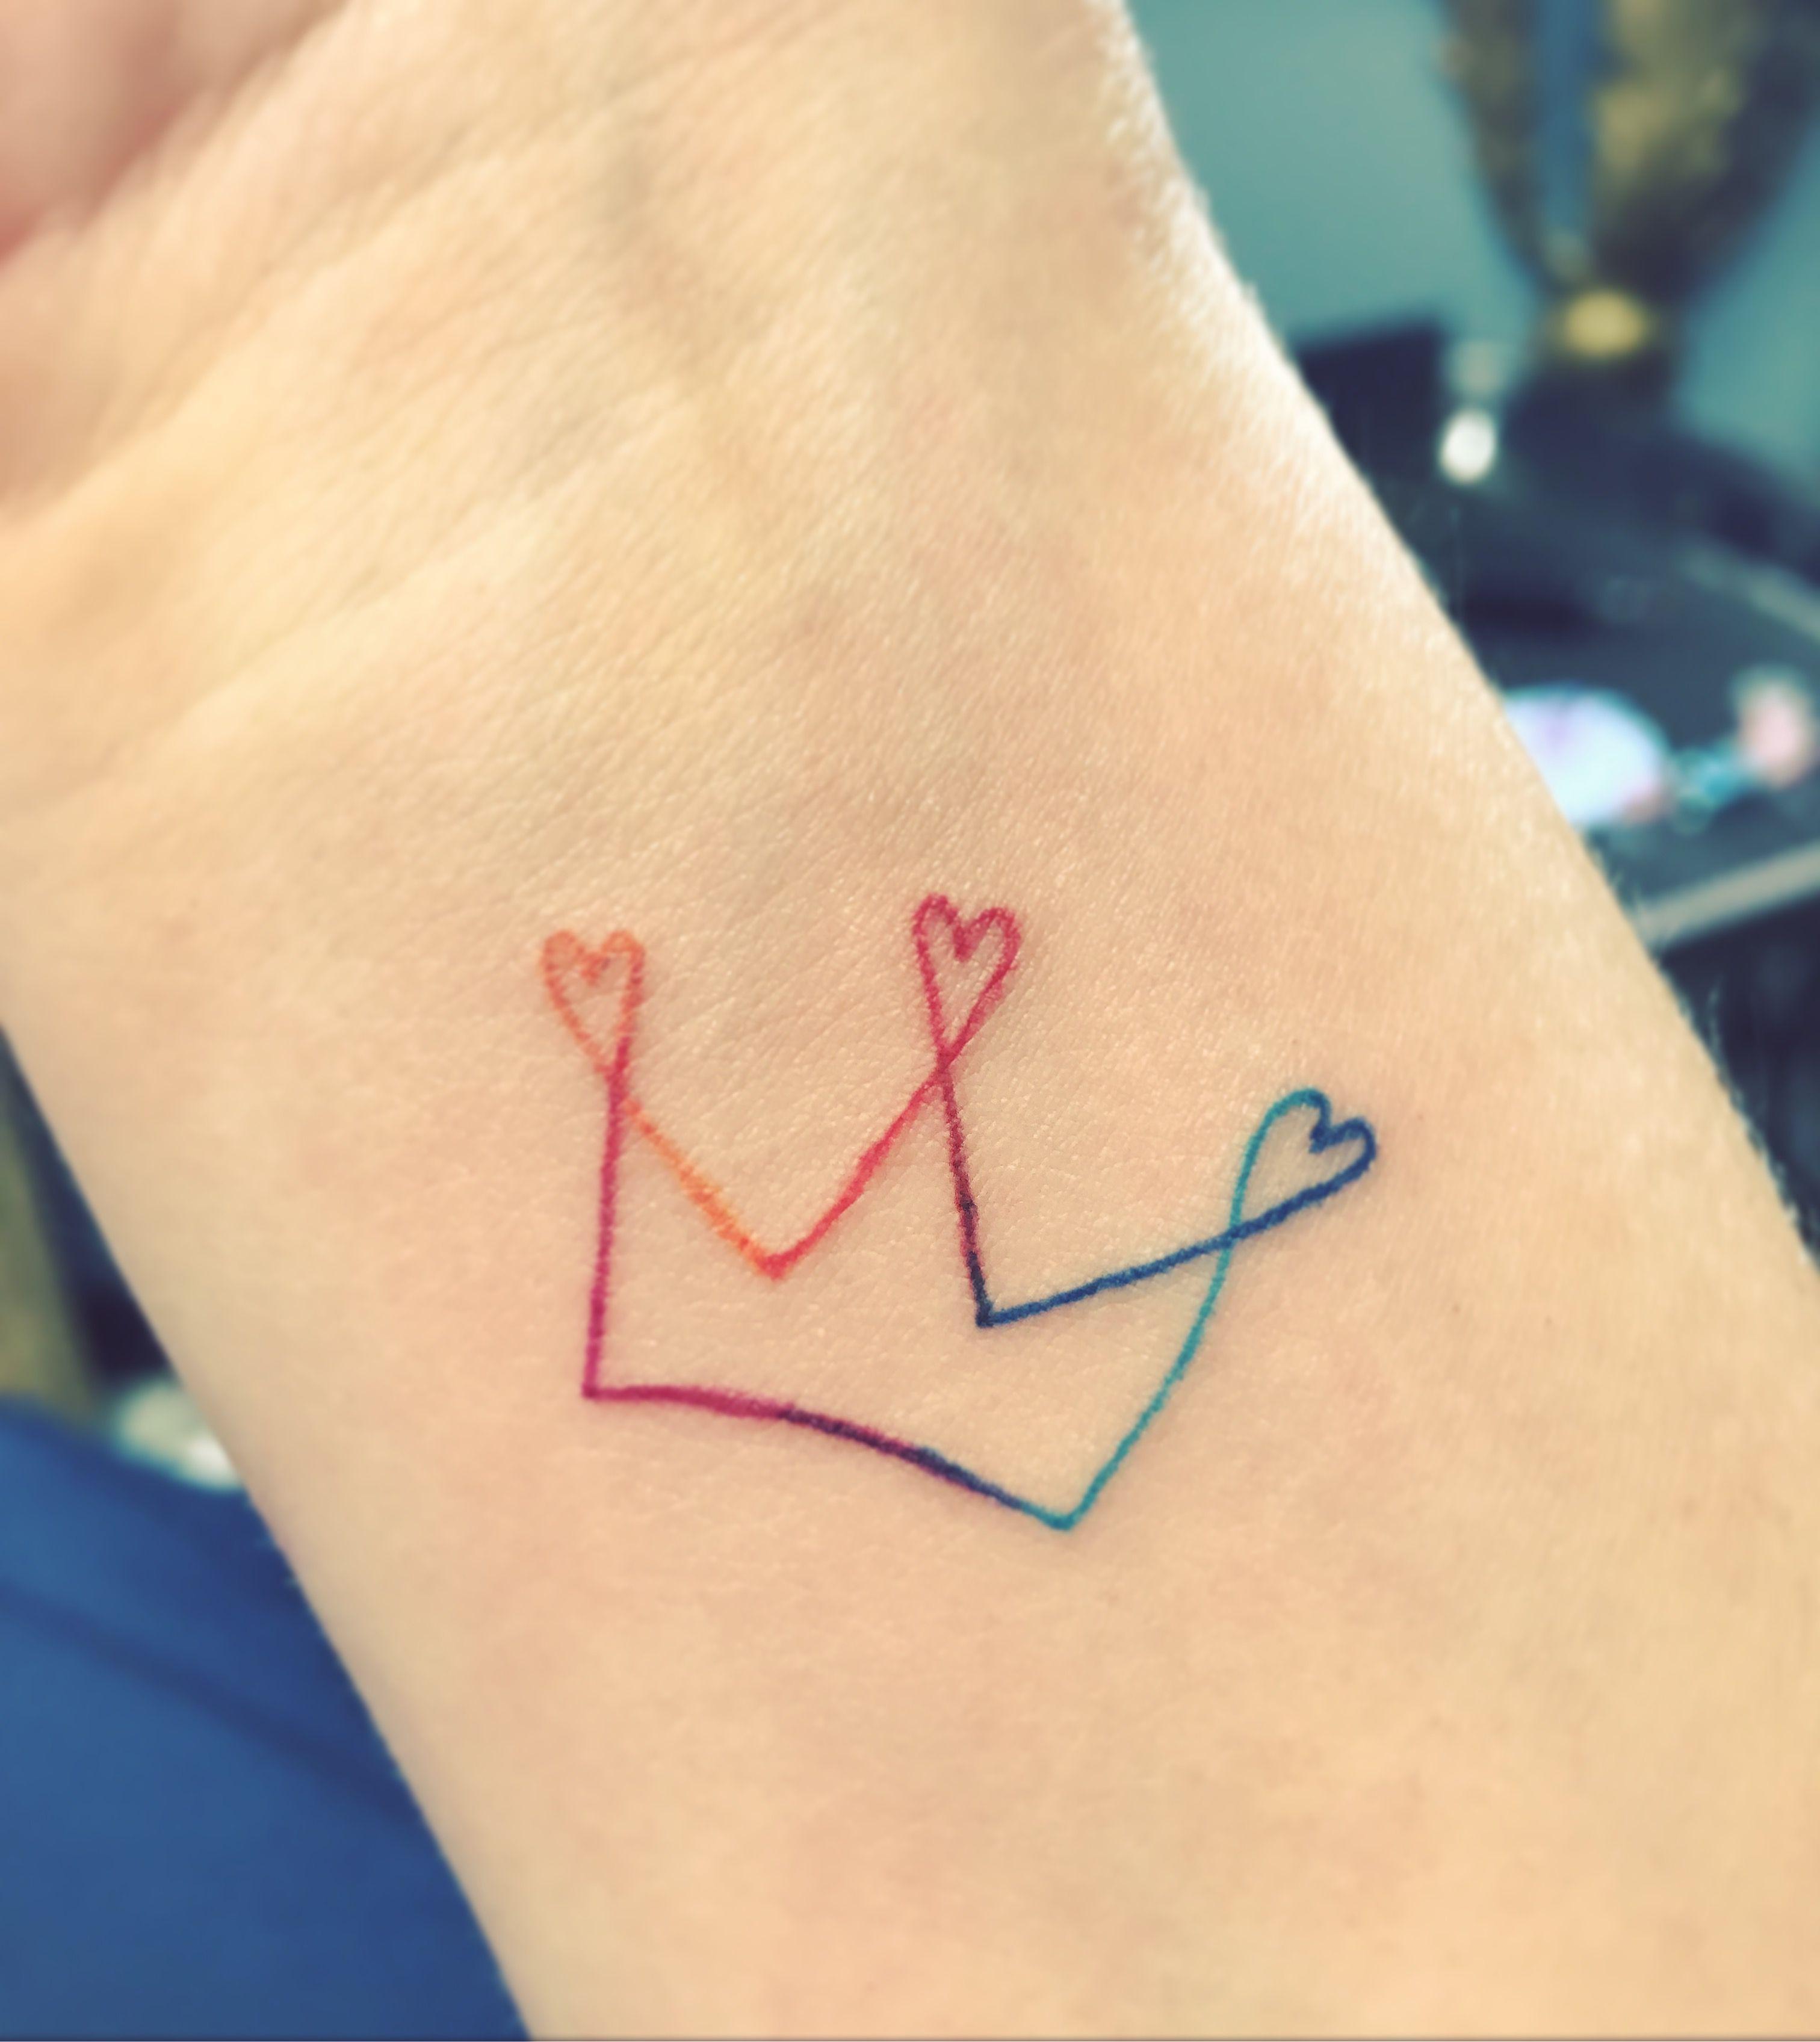 Rainbow Crown Tattoo Multi Color Tattoo Small Tattoo Rainbow Tattoos Small Tattoos Small Hand Tattoos